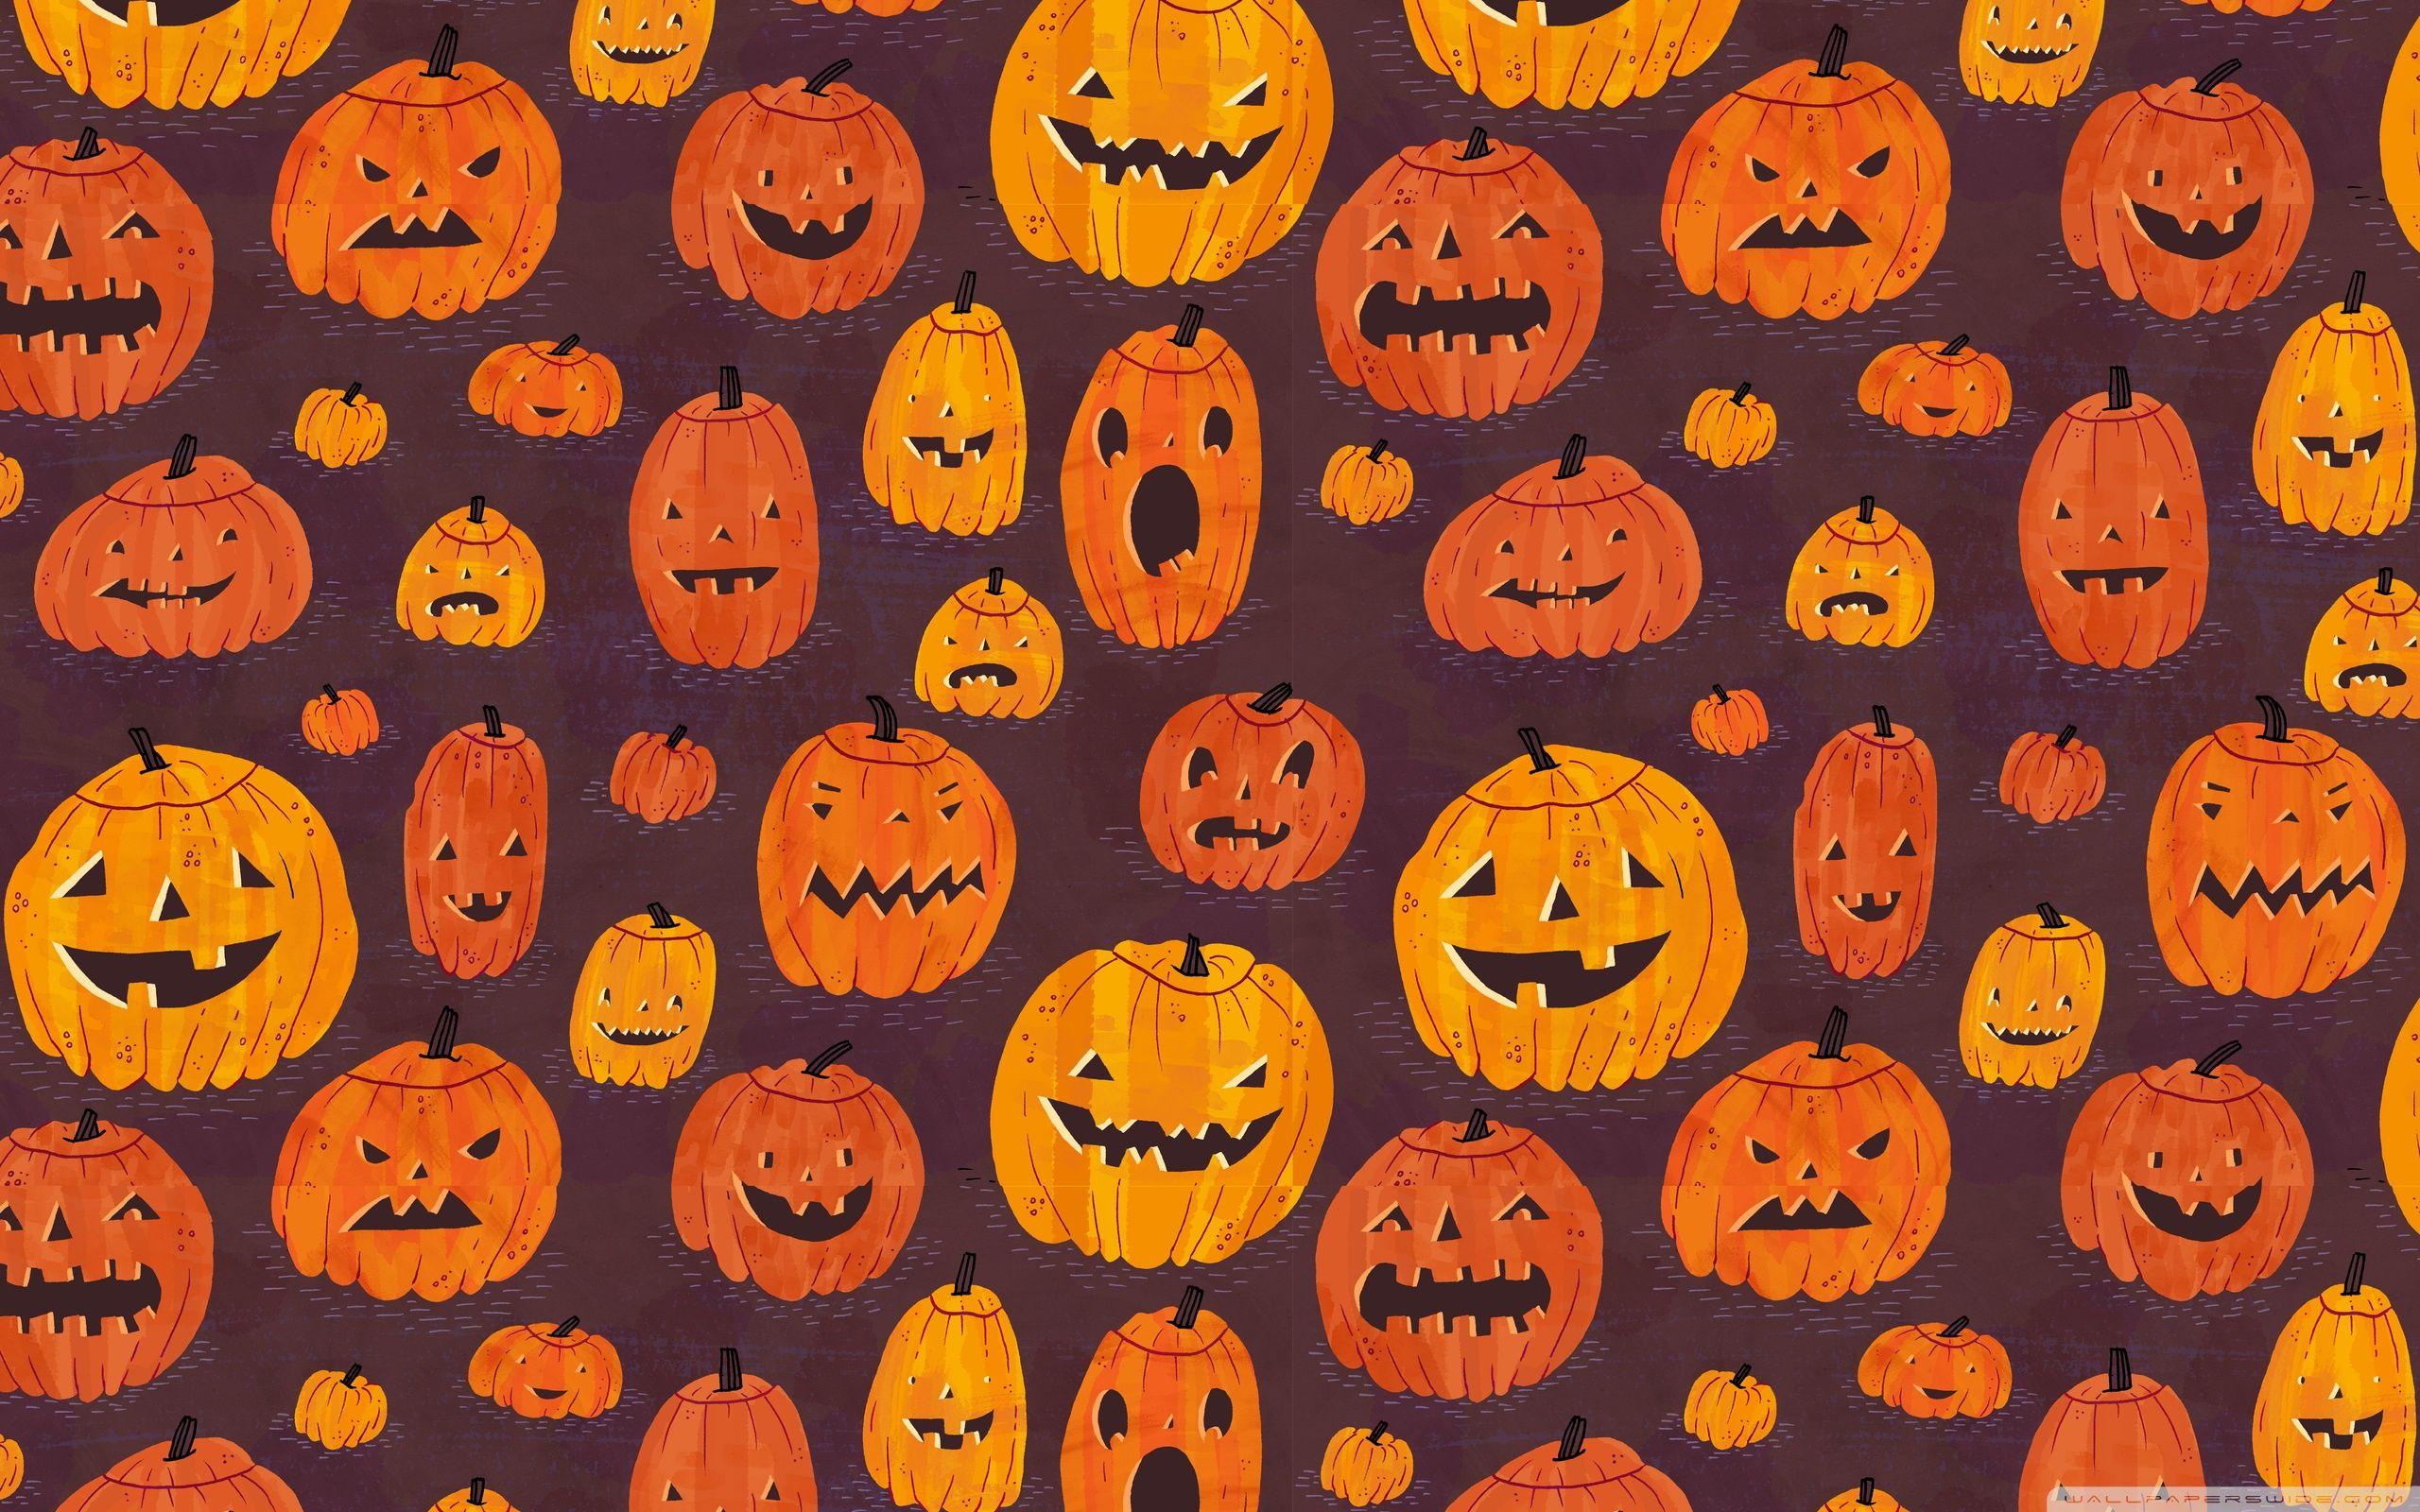 21+] October Backgrounds on WallpaperSafari